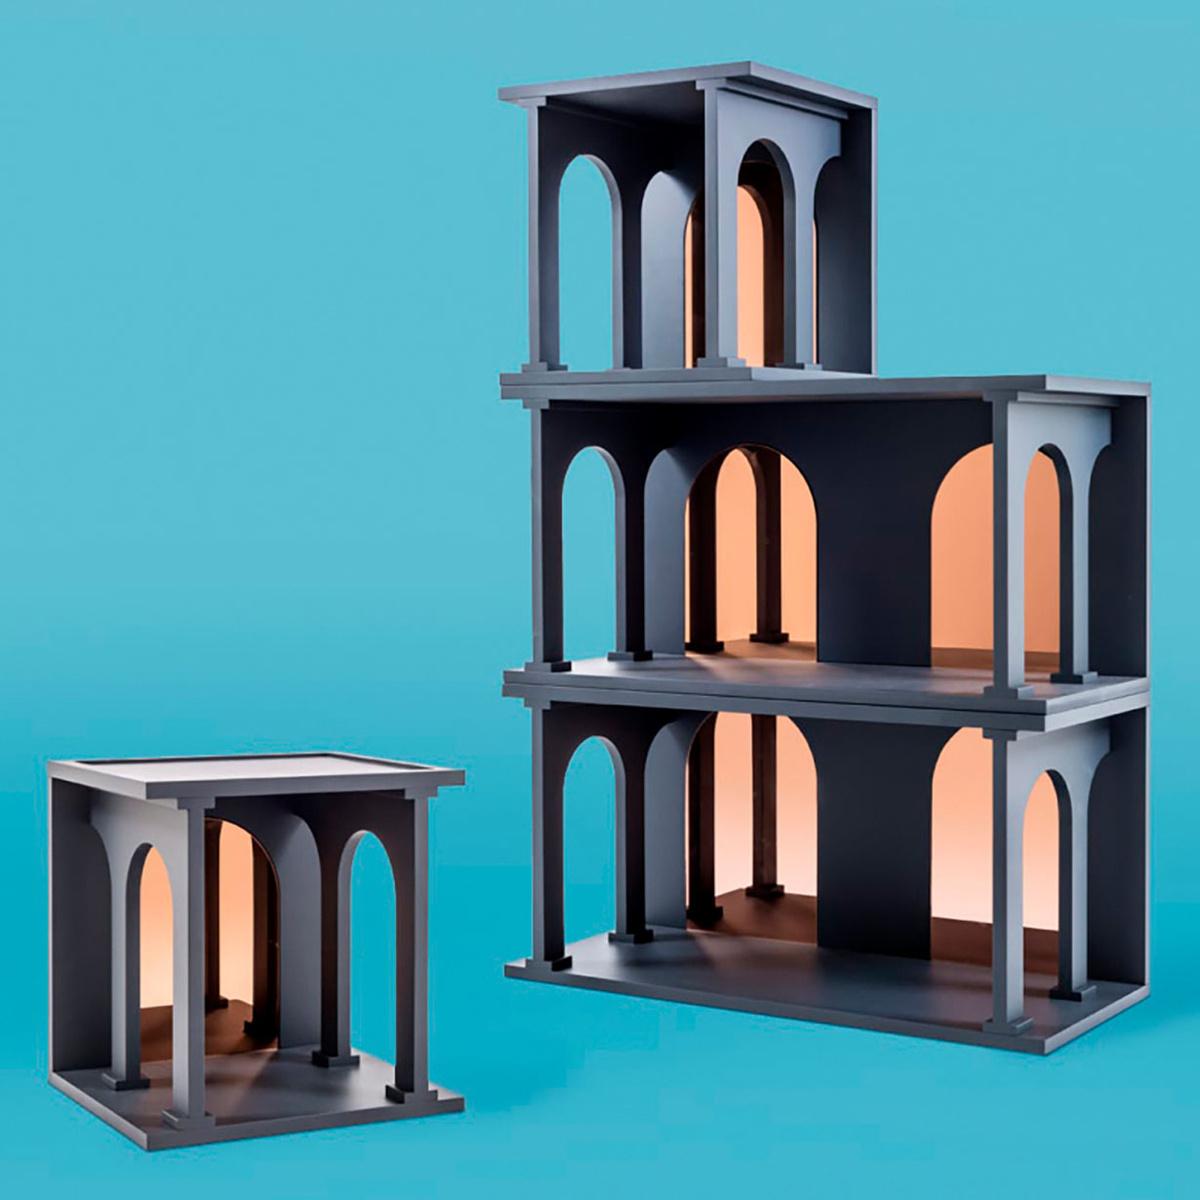 biblioth que modulaire renaissance arco double by. Black Bedroom Furniture Sets. Home Design Ideas